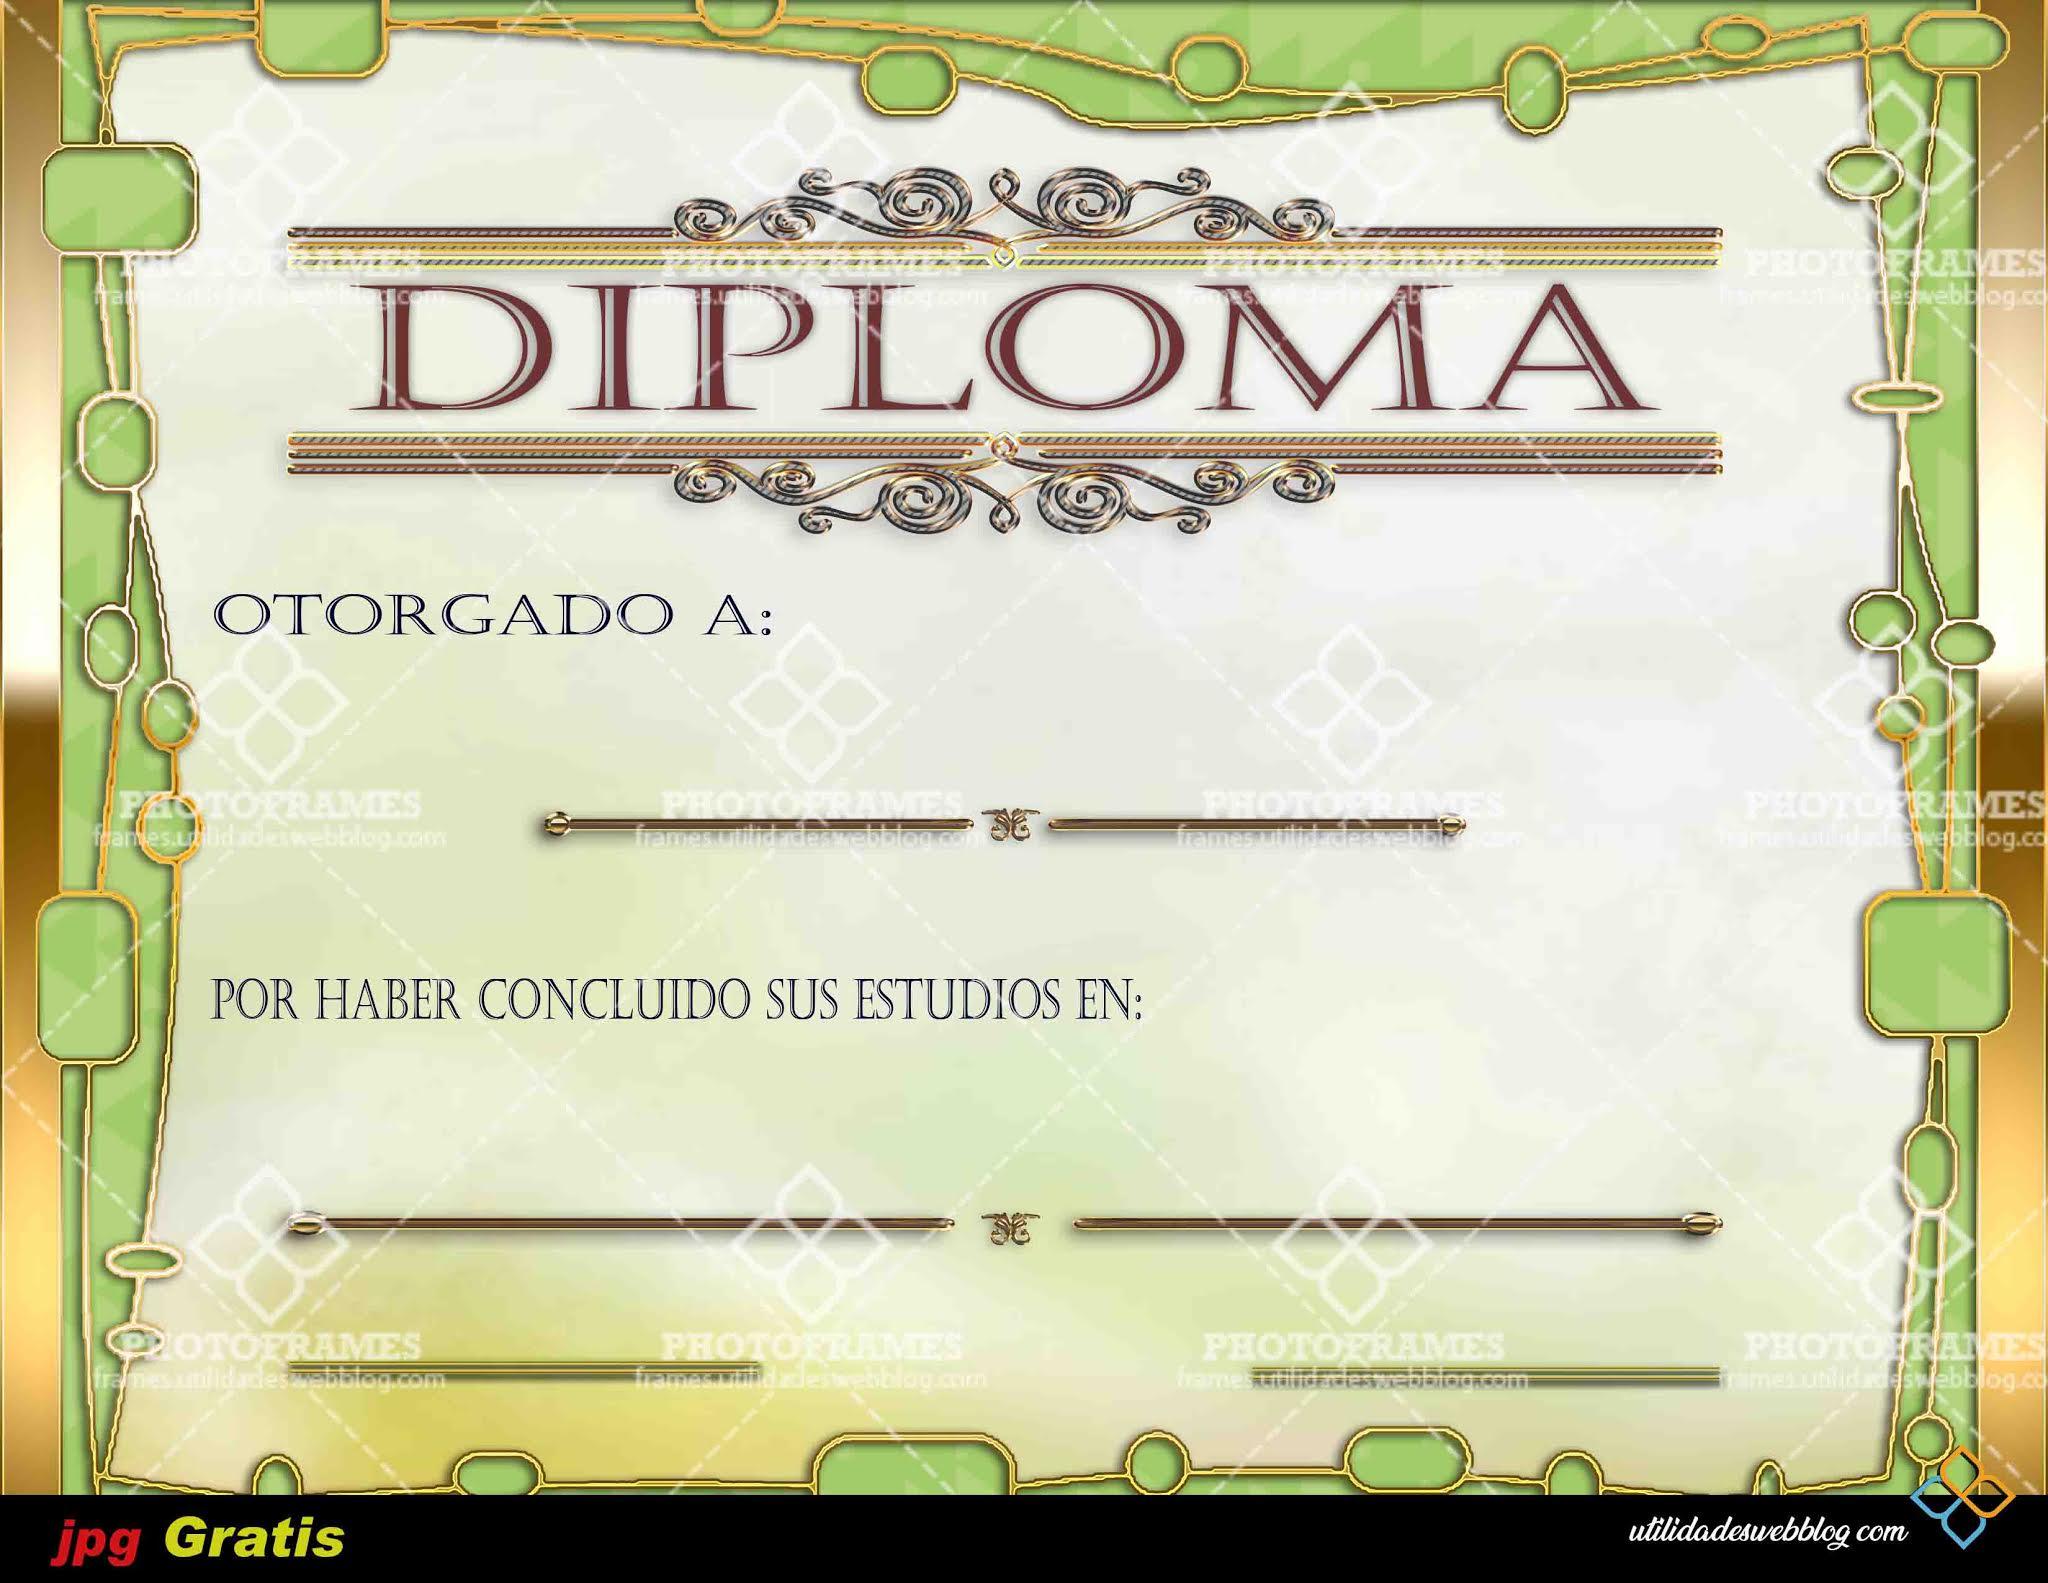 Diploma infantil color verde y dorado con motivo a fin de curso